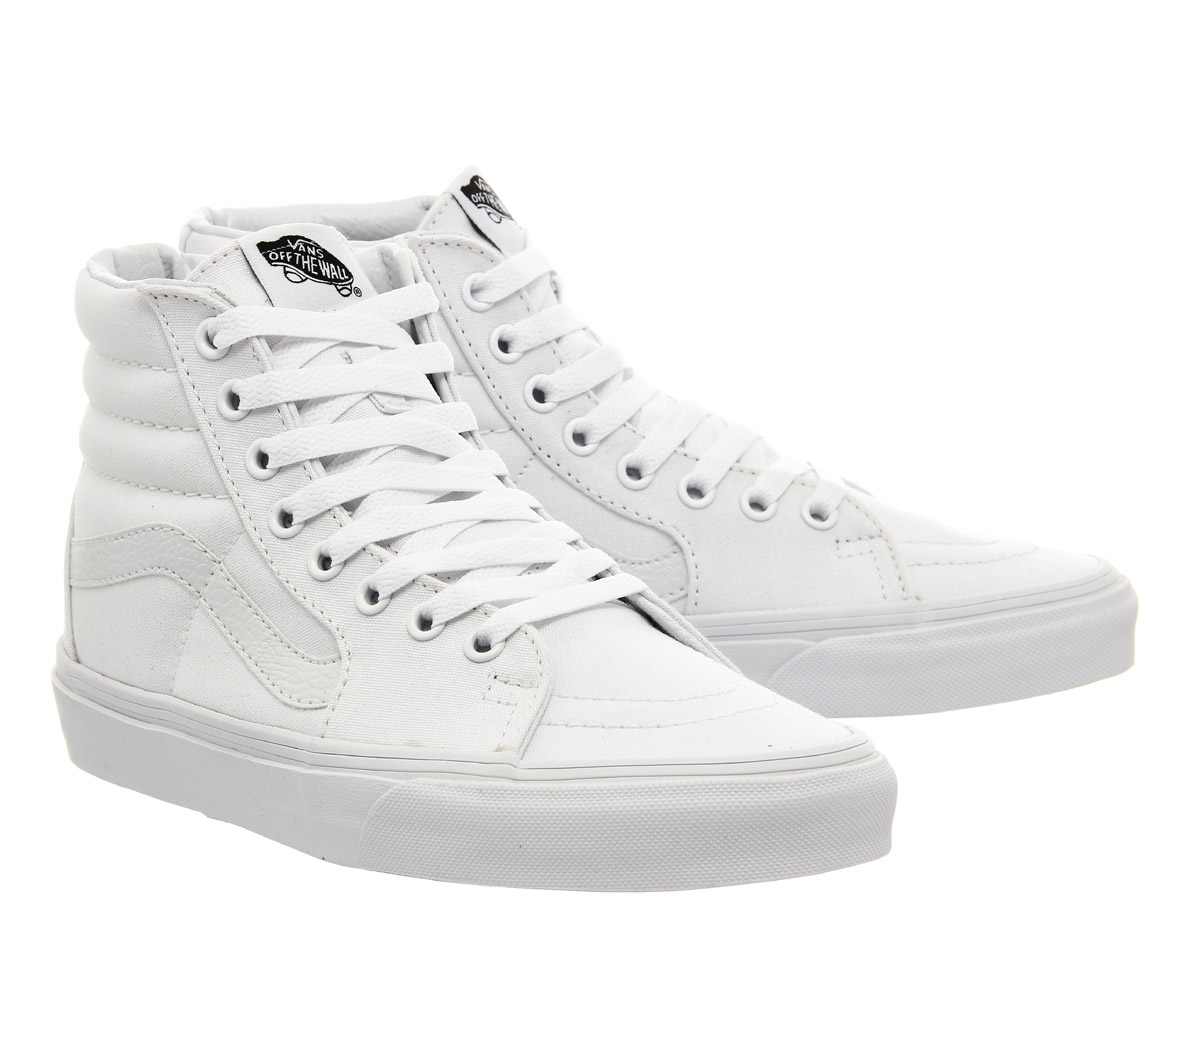 fa885f7892d Sentinel Womens Vans Sk8 Hi True White Trainers Shoes